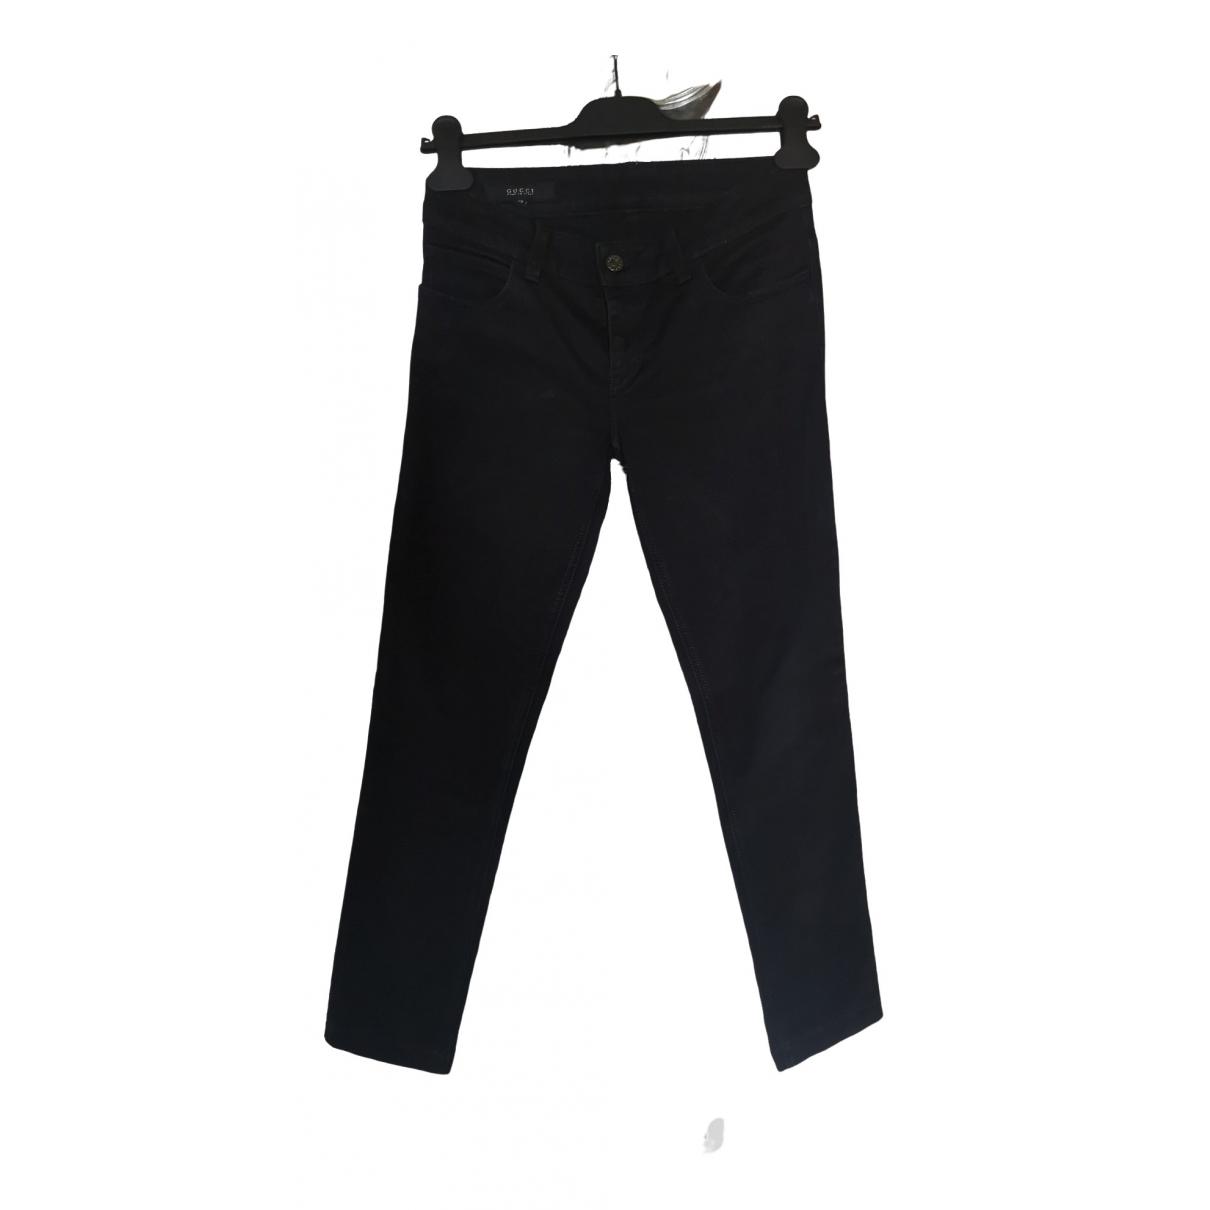 Gucci \N Black Denim - Jeans Trousers for Women 38 IT